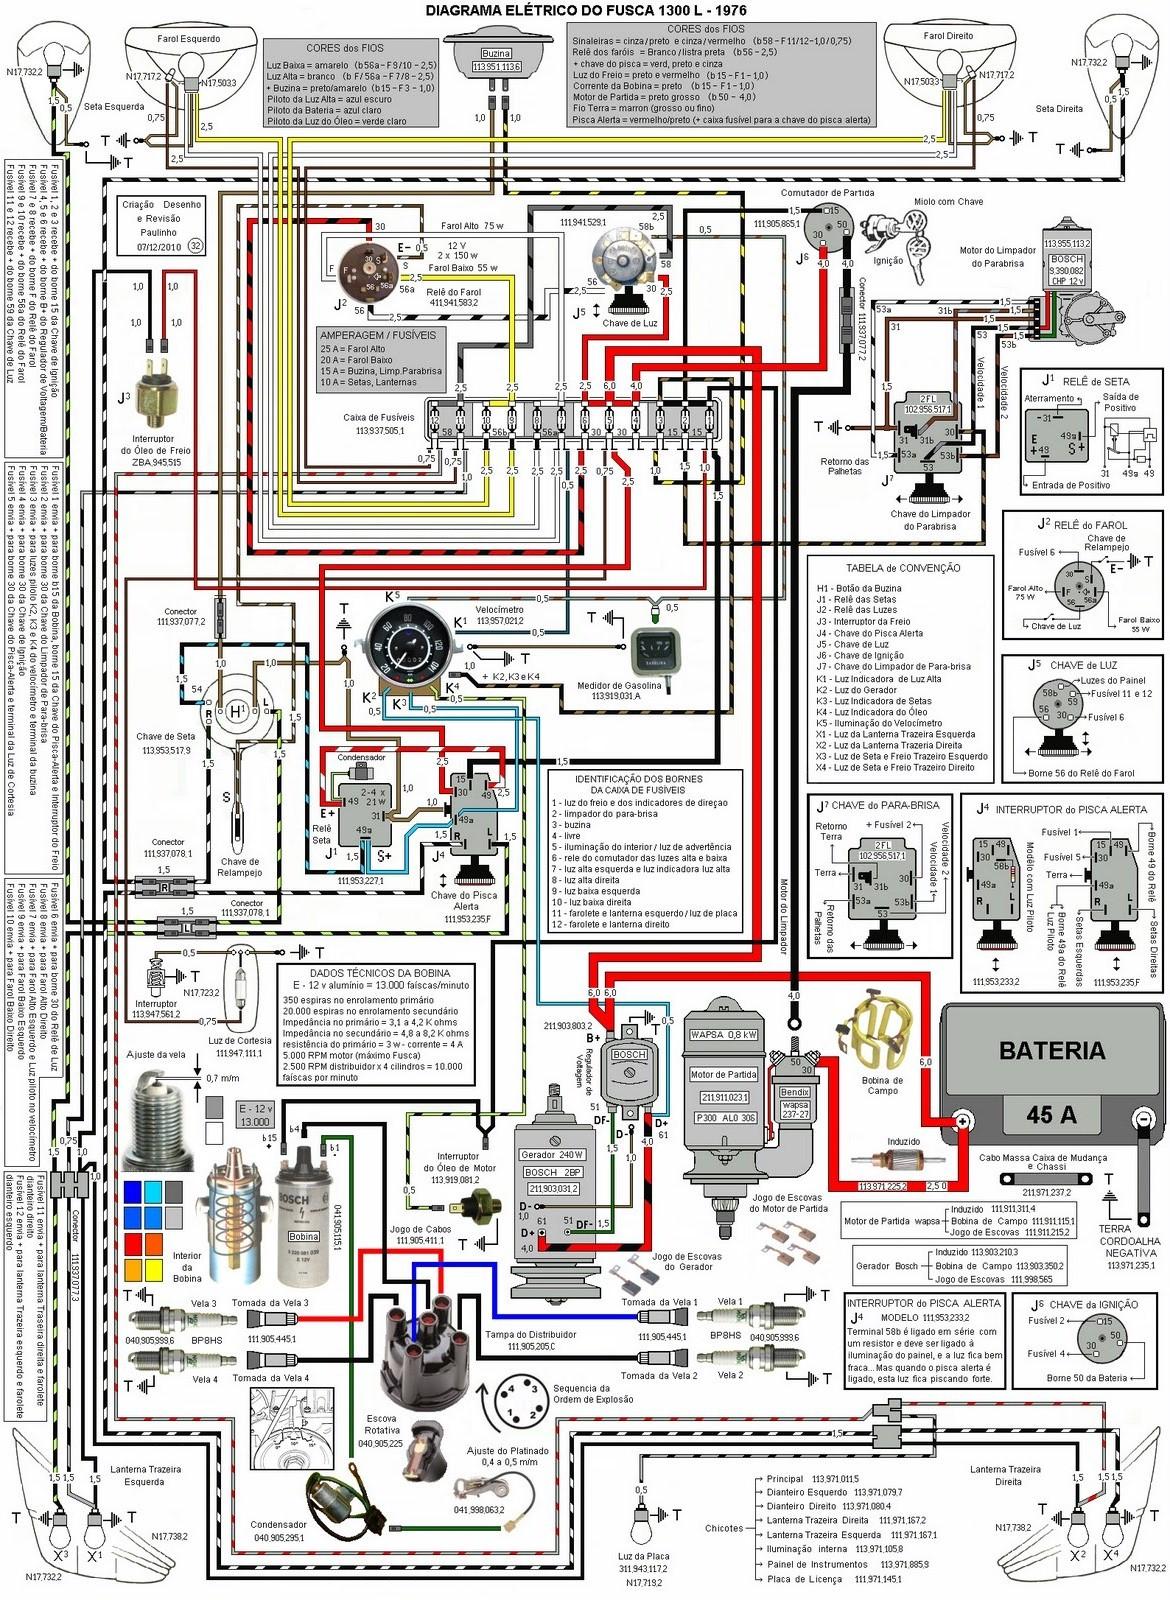 Joao Carlos Joaocarlosrs On Pinterest Polaris 300 Wiring Diagram